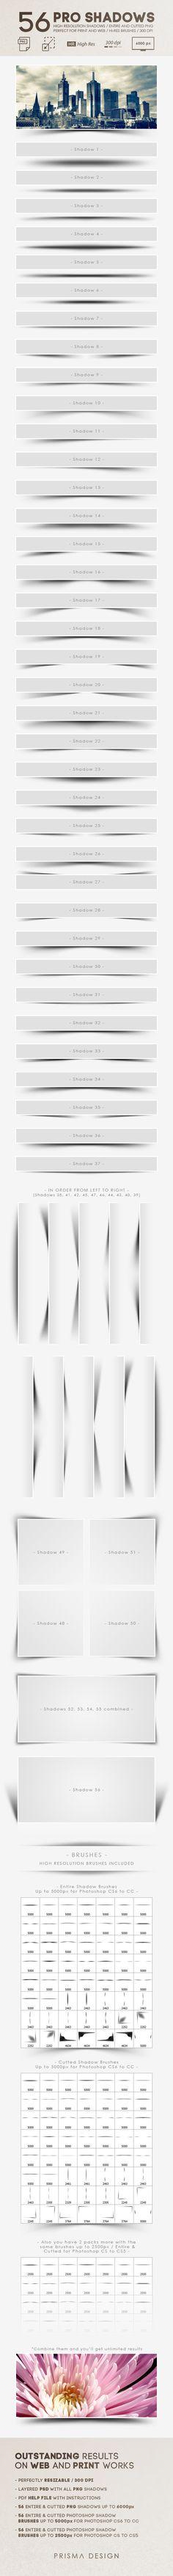 56 Pro Shadows for Photoshop #design Download: http://graphicriver.net/item/56-pro-shadows/7712788?ref=ksioks